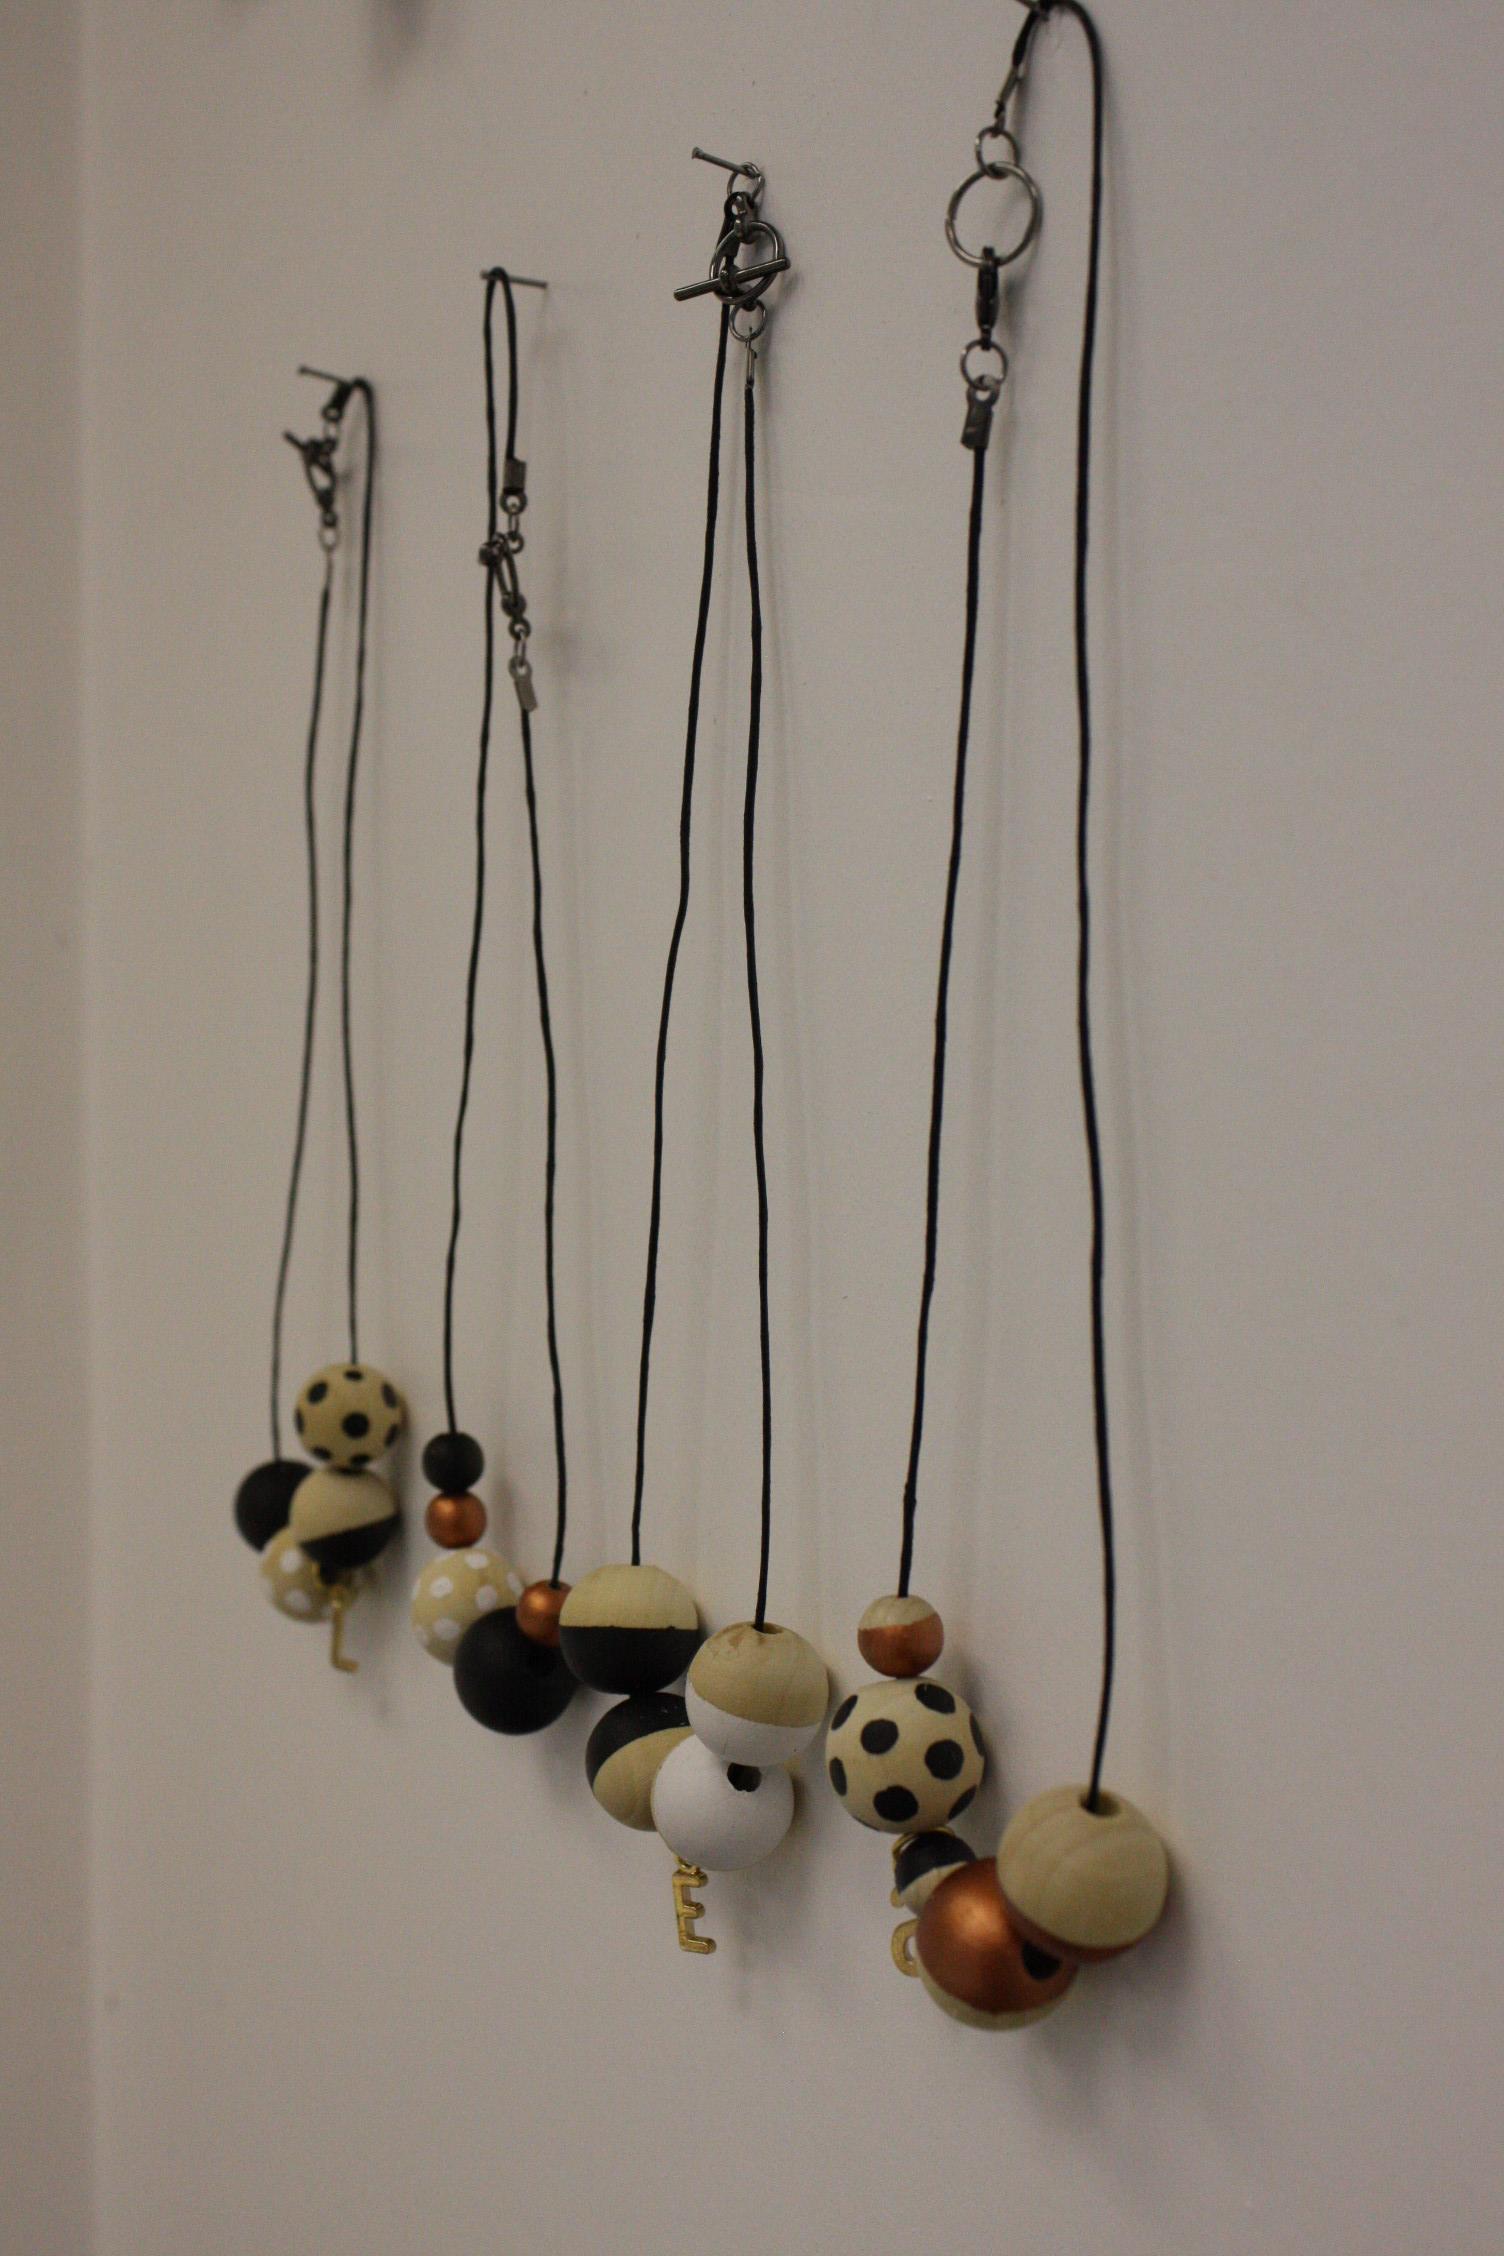 Handmade_Jewellery_Collaboration_LaurenTaylor&EmmaCrabtree.jpg